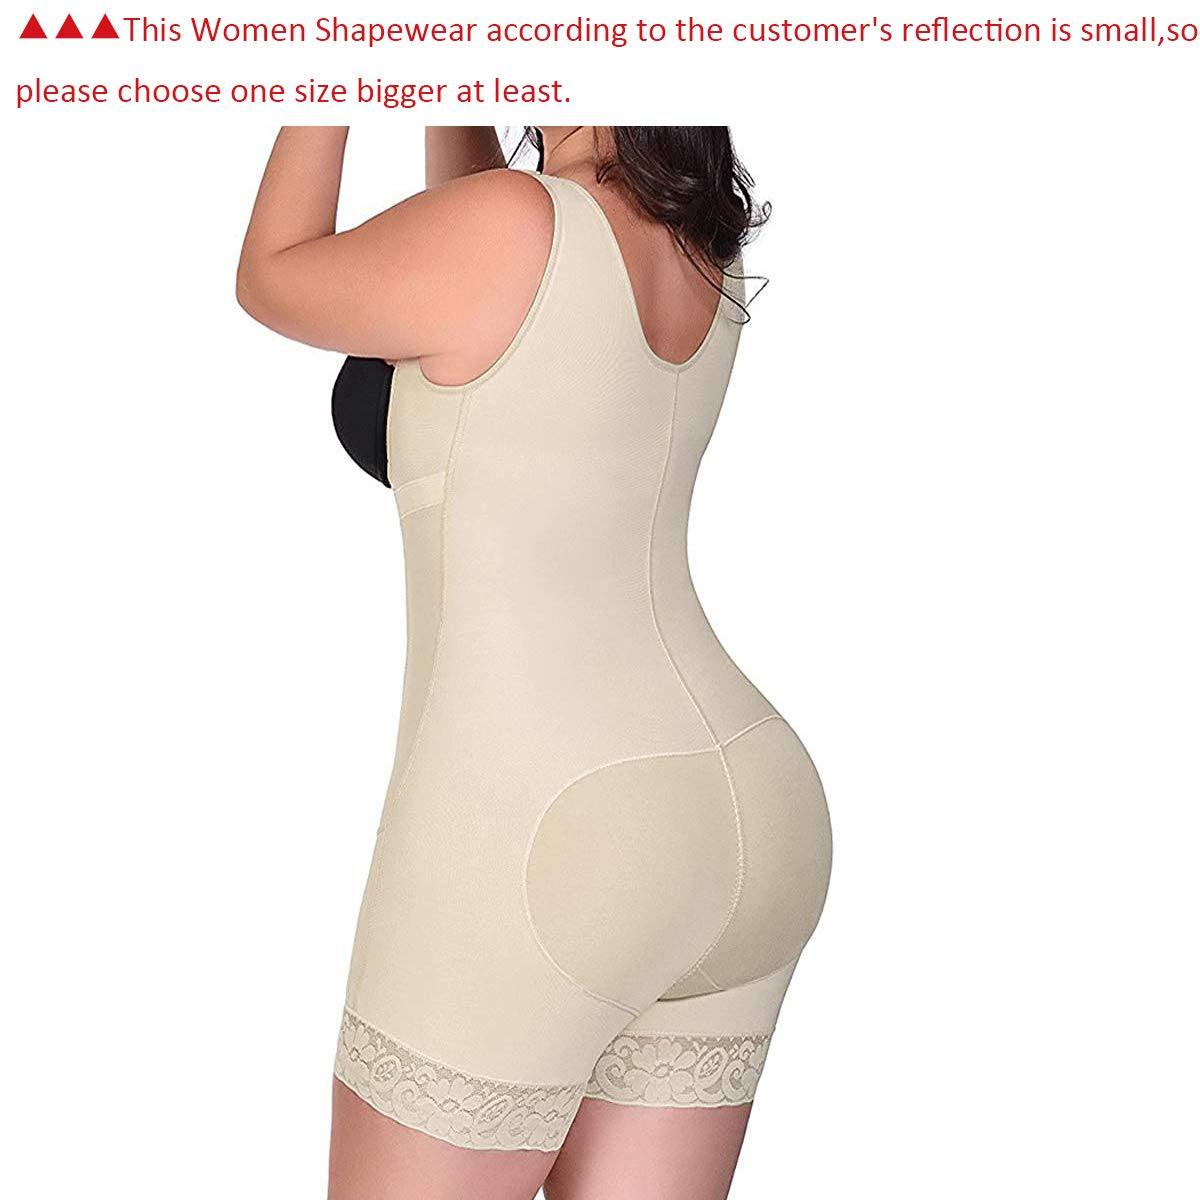 eade9134418 RIBIKA Women Body Shapewear Slimming Corset Tummy Control Waist Shaper  Bodysuit Shapers larger image